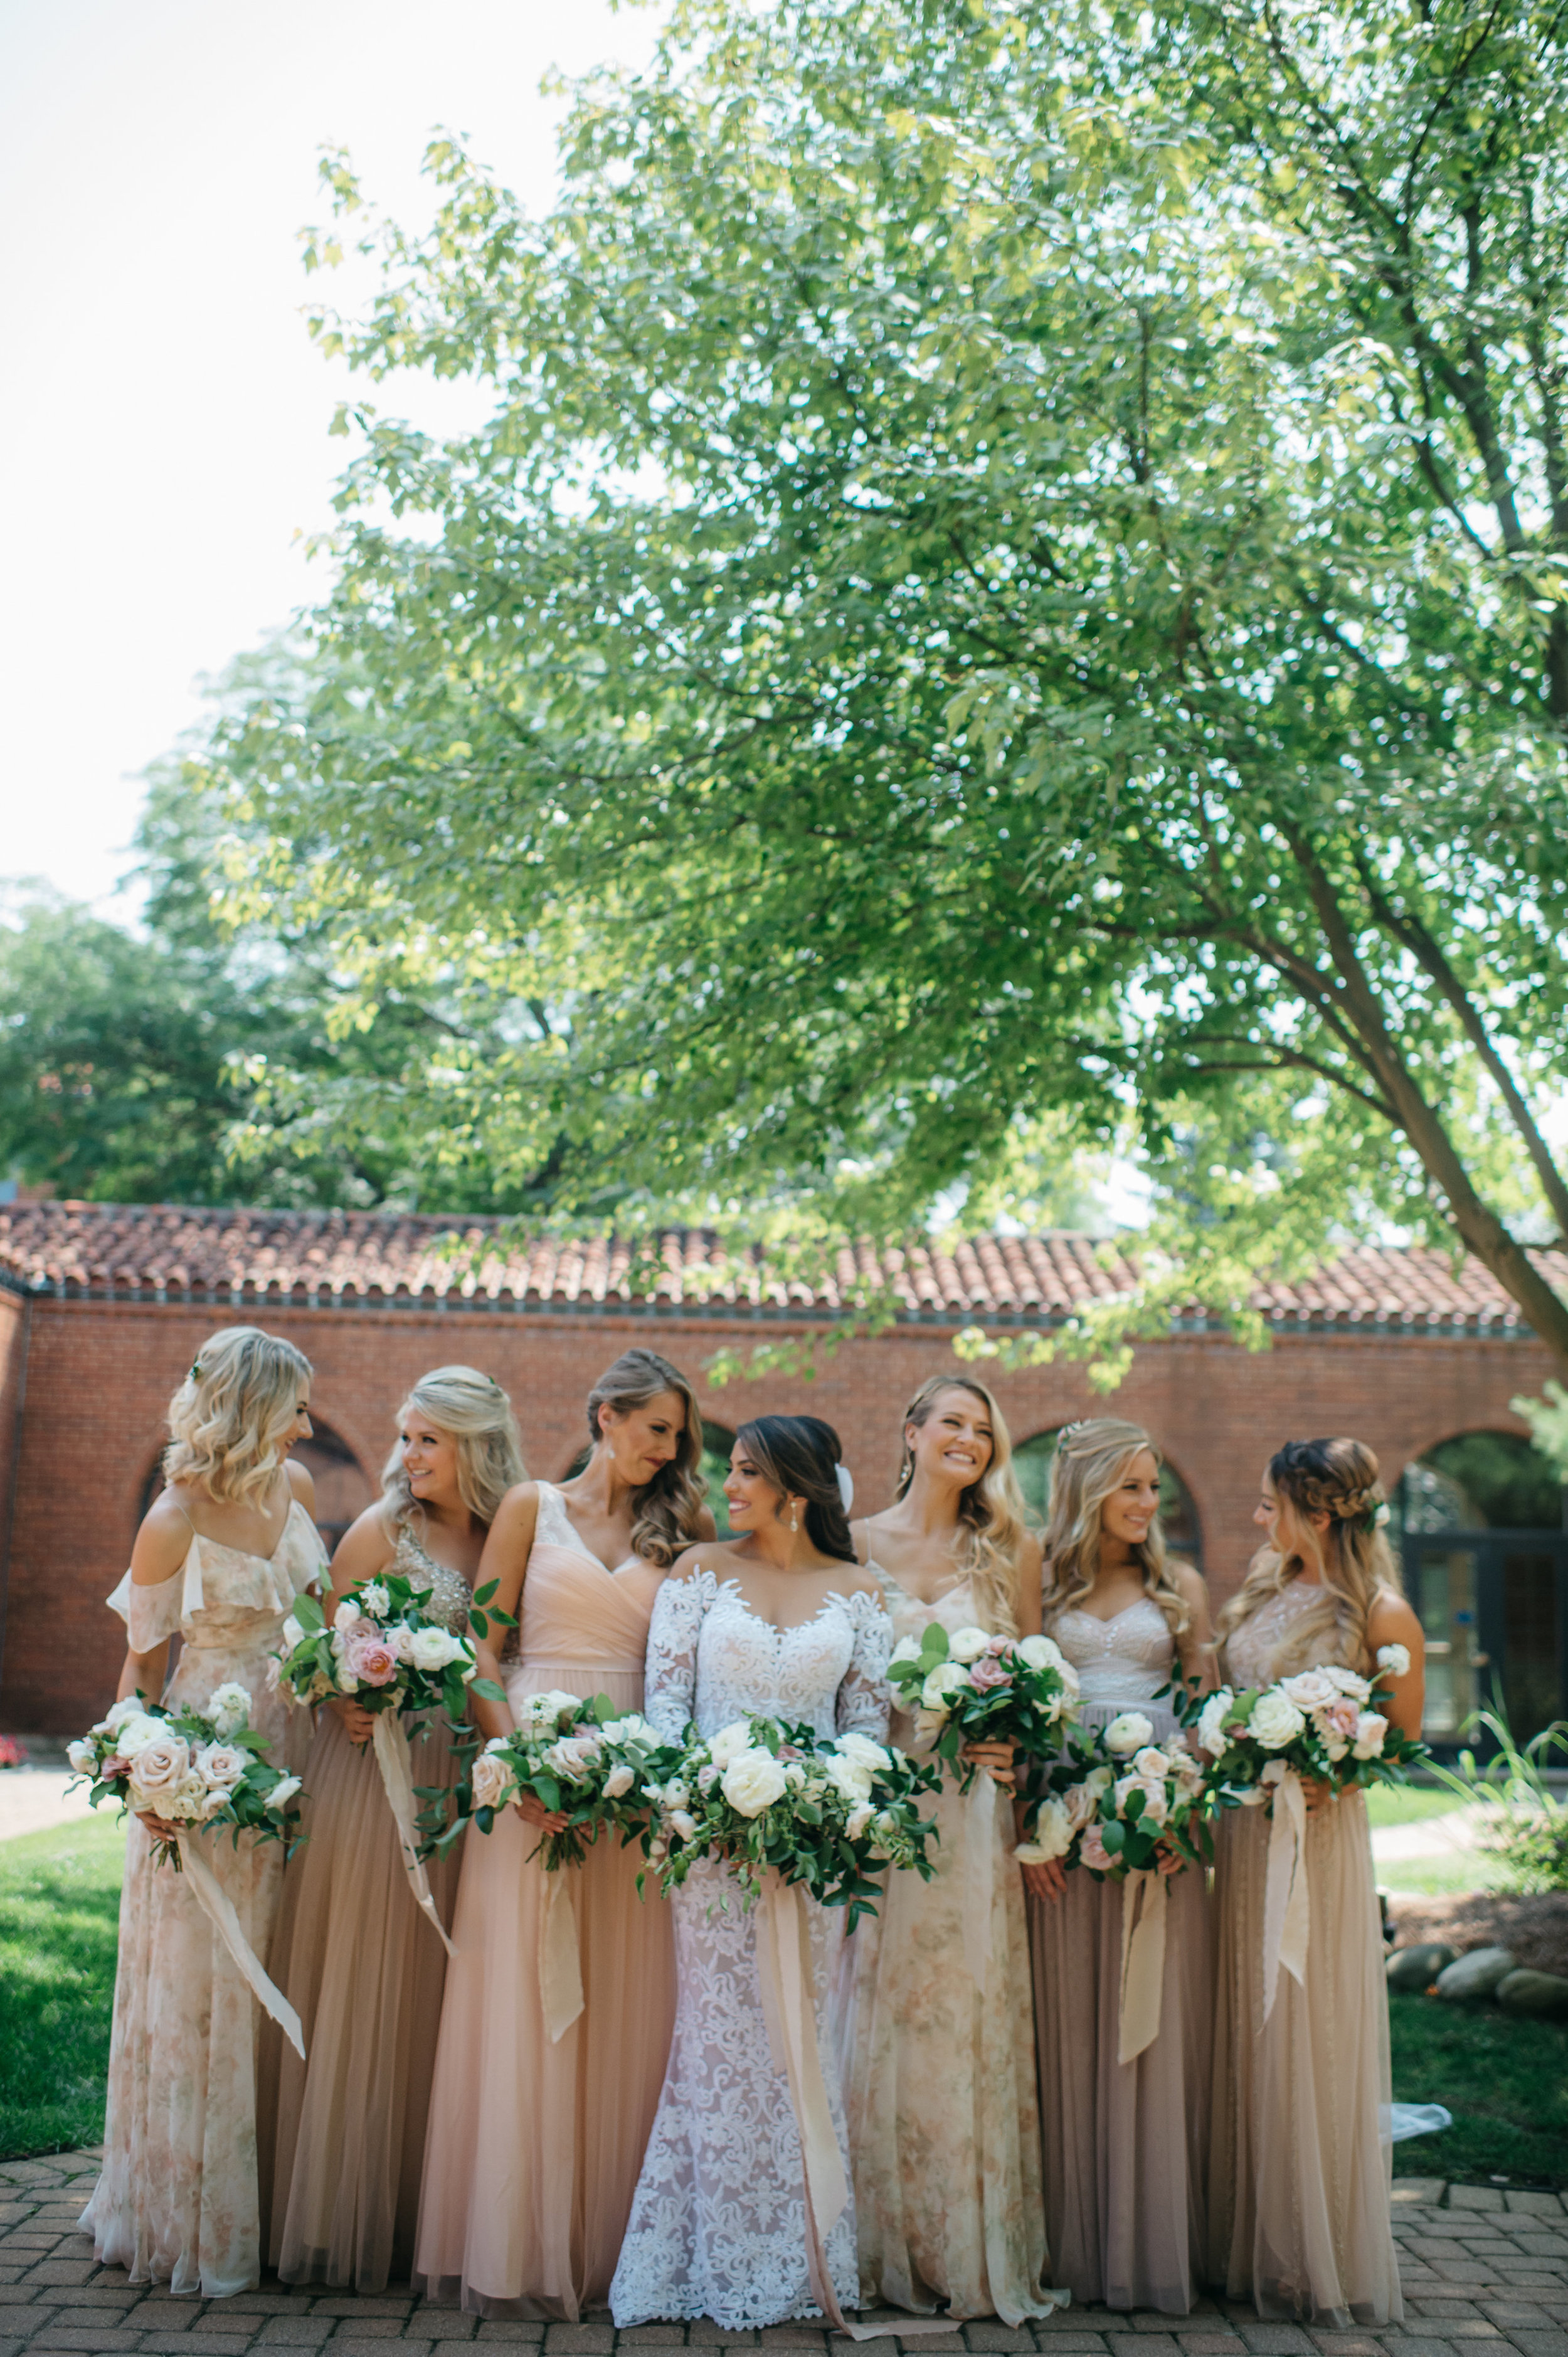 custom wedding planners michigan event design paper goods florals bridal party bridesmaids bouquets